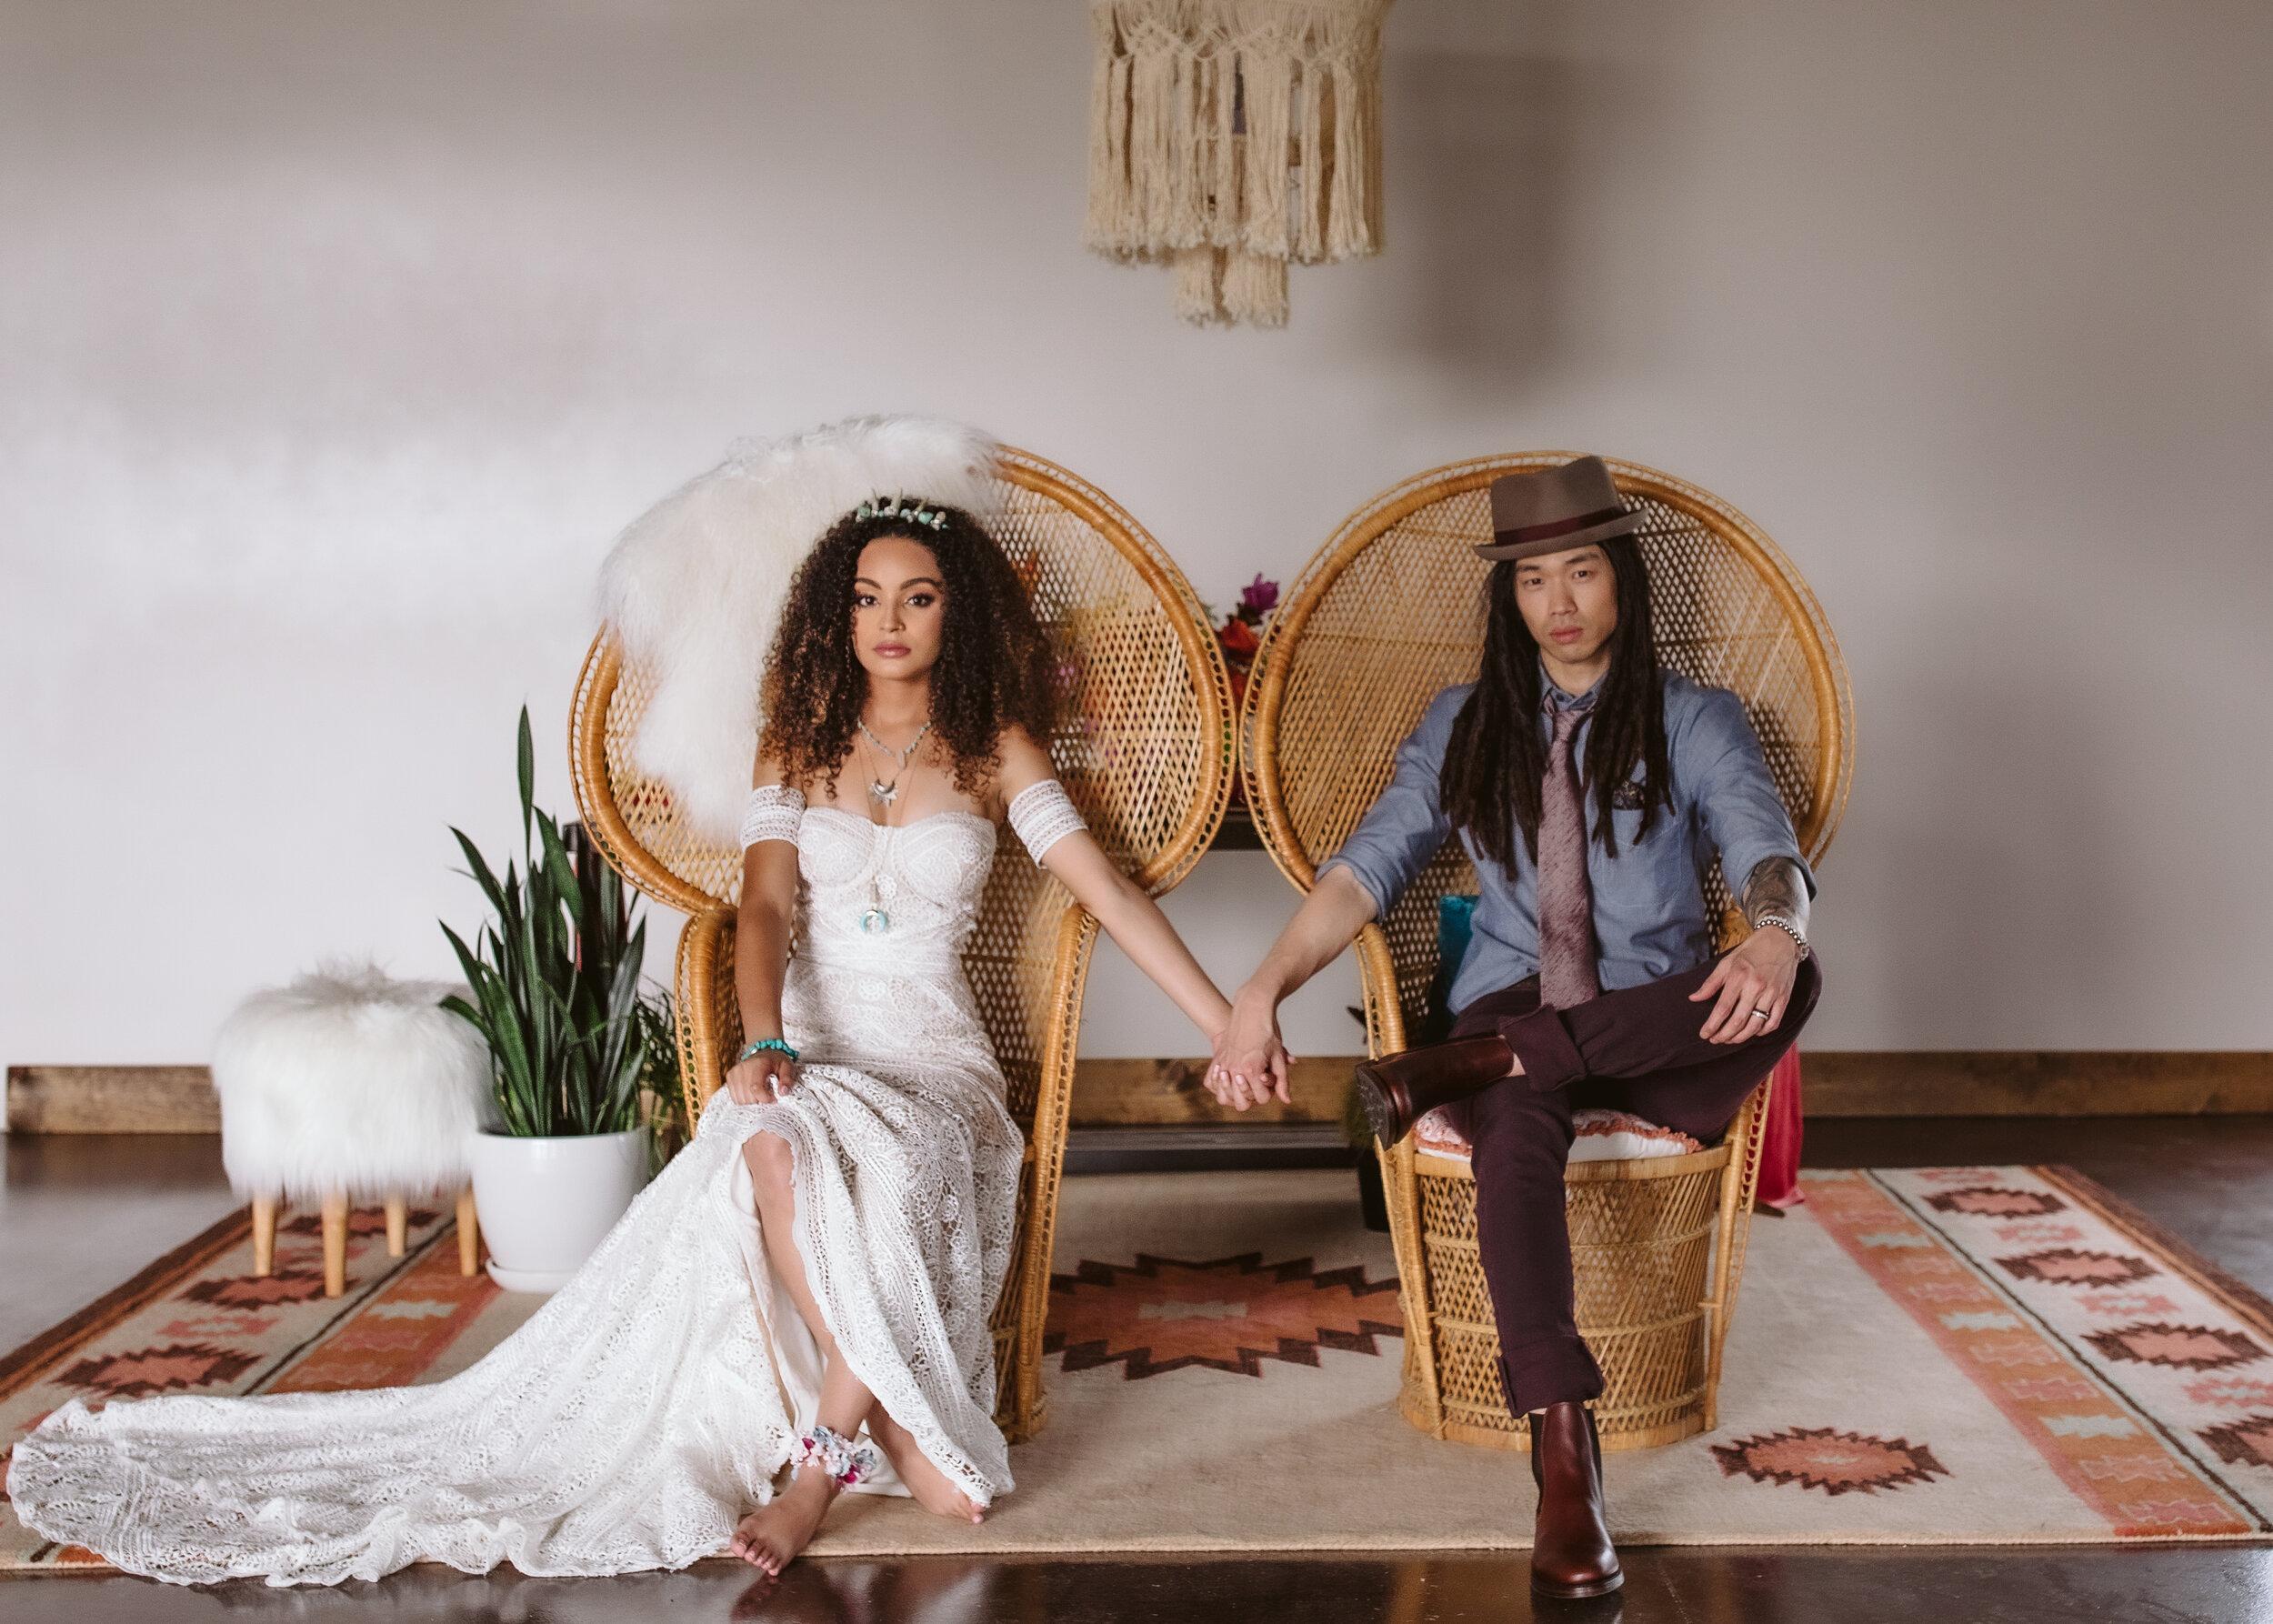 Gowns - All My Heart BridalBRIDESomething White Bridal BoutiqueThe Gown Gallery Bridal ExtraordinaireUrban Bridal ShopKathryn Lee Bridal